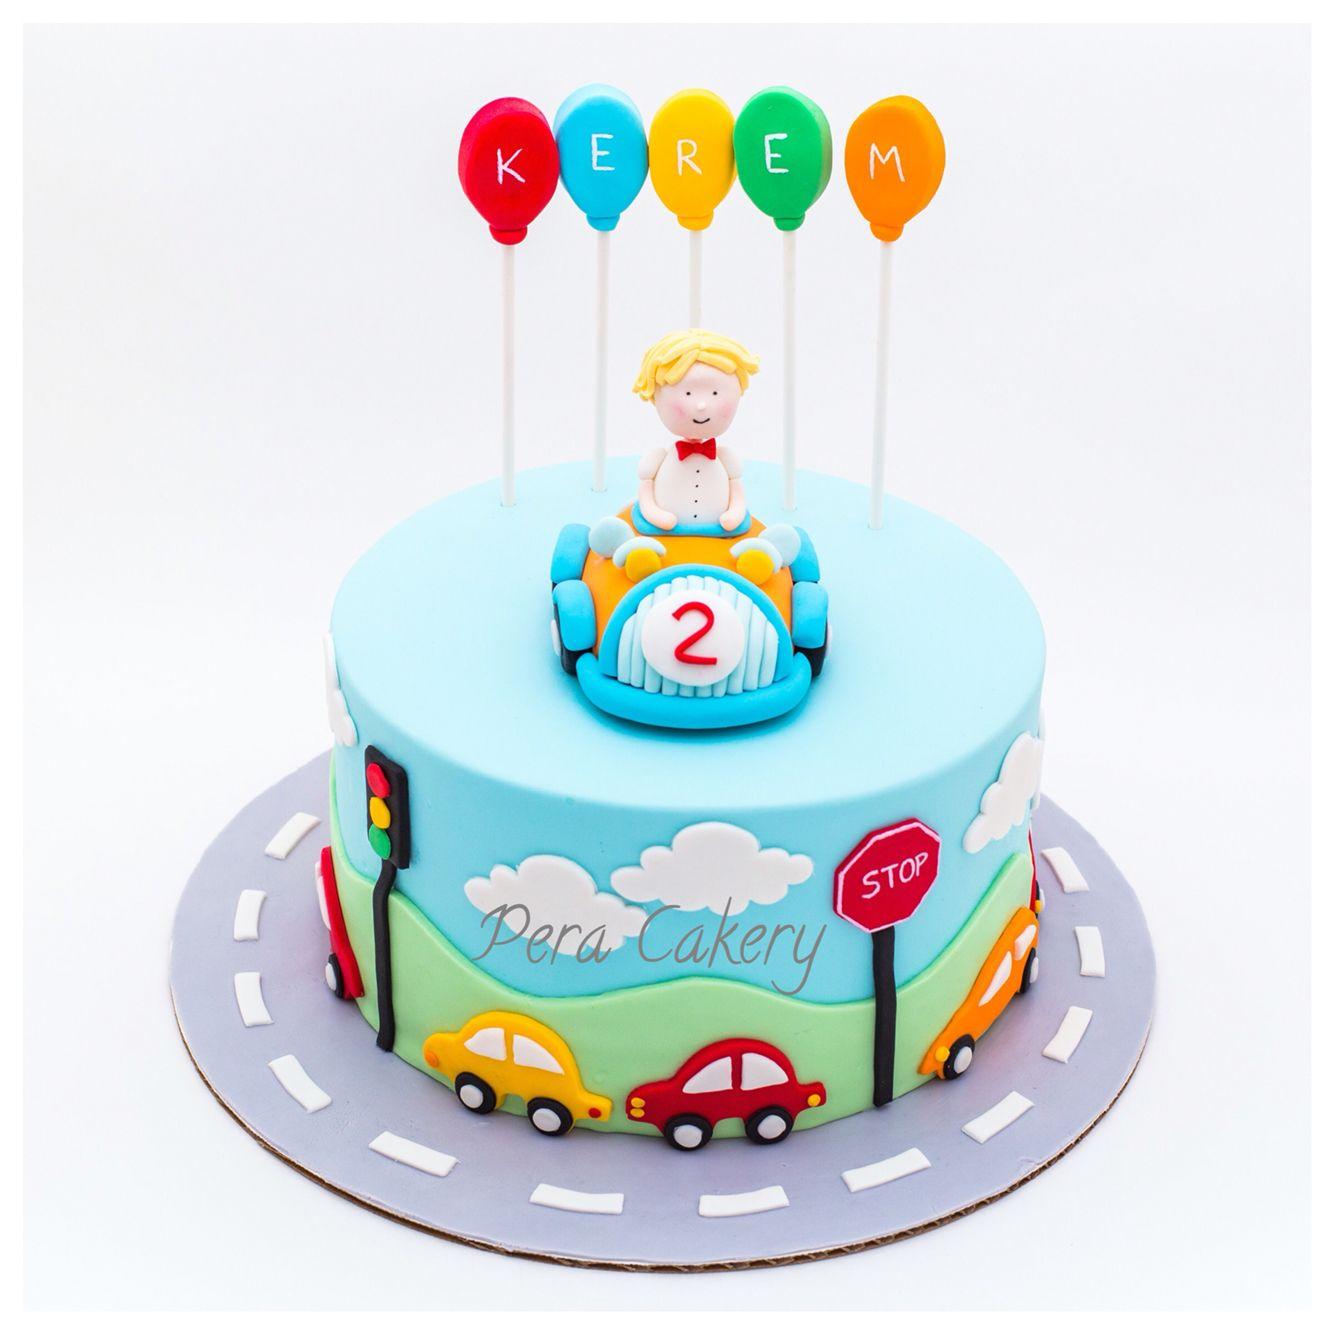 Birthday Cake Boy Car Cake For A 2 Year Old Boy Pera Cakery Cakes